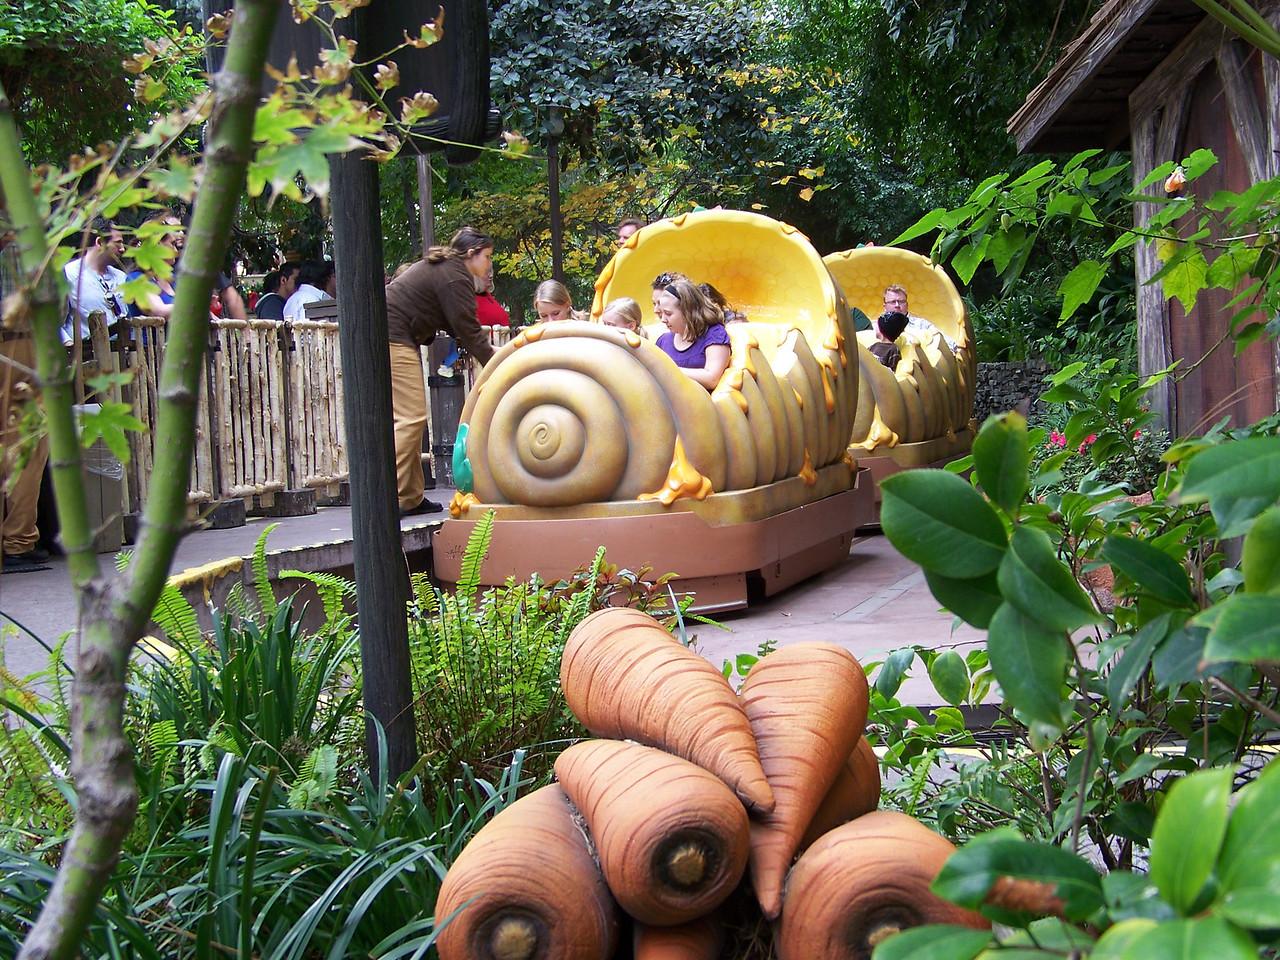 Disneyland - The Many Adventures of Winnie the Pooh